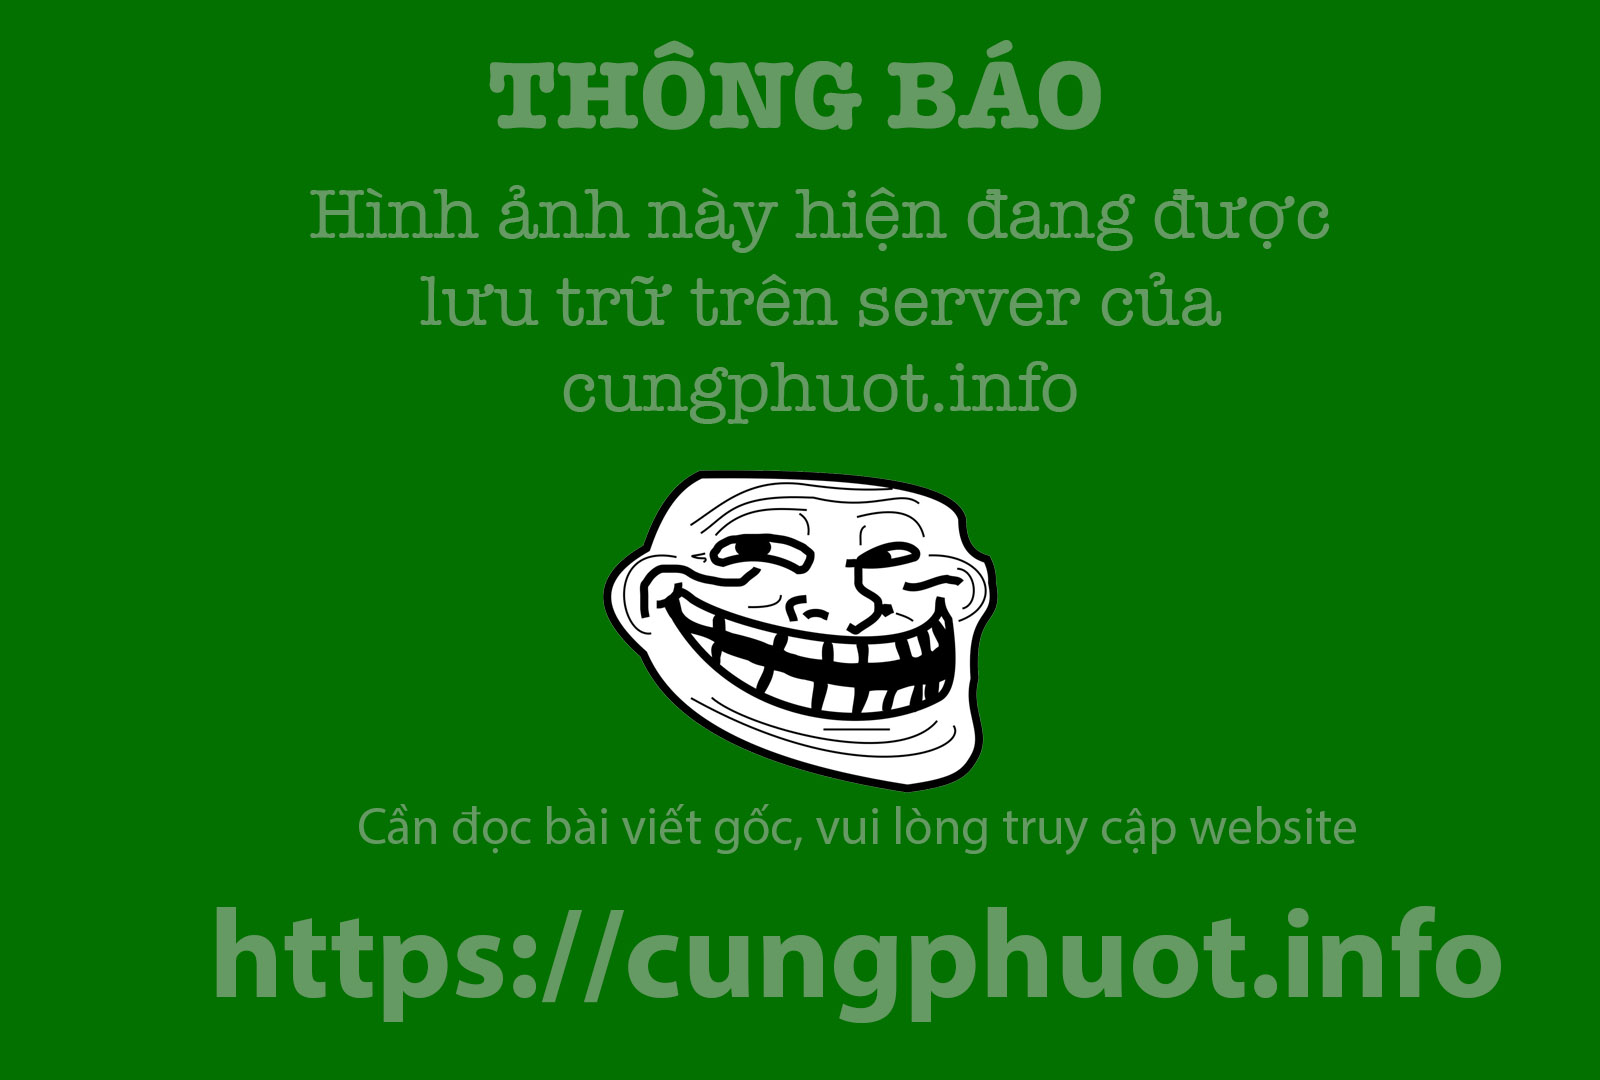 Ve dep thanh cao, huyen bi cua Dan vien Chau Son hinh anh 11